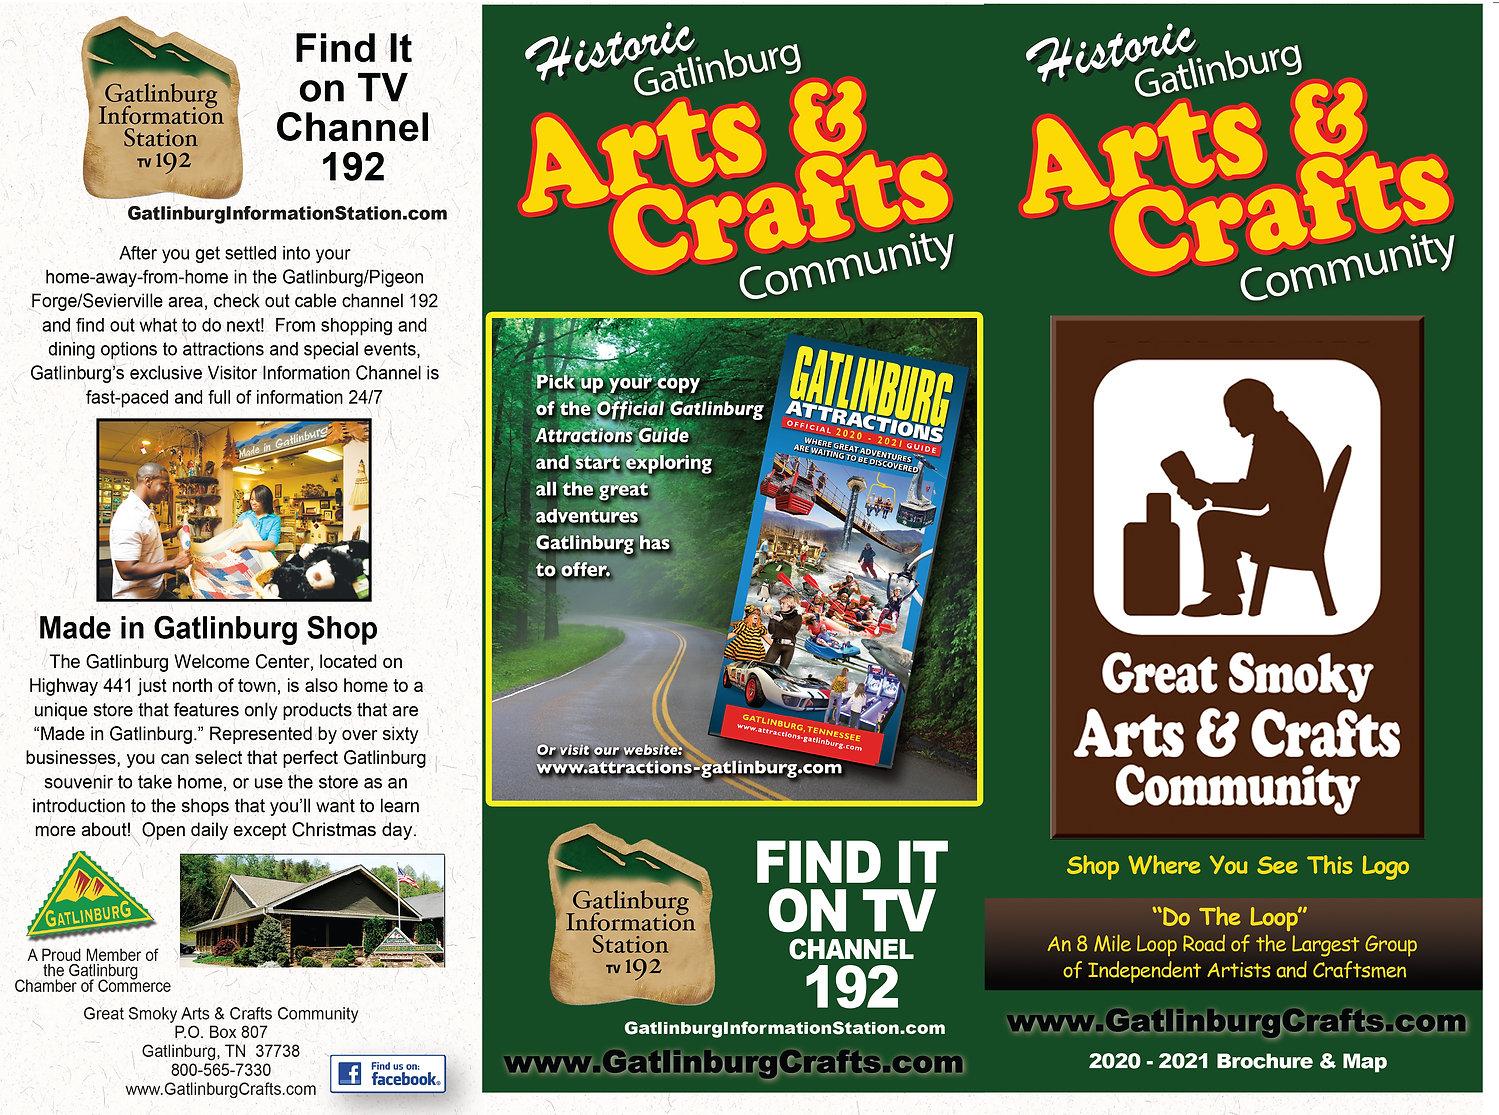 acc brochure FRONT 2020-21 WEB BROCH1.jp